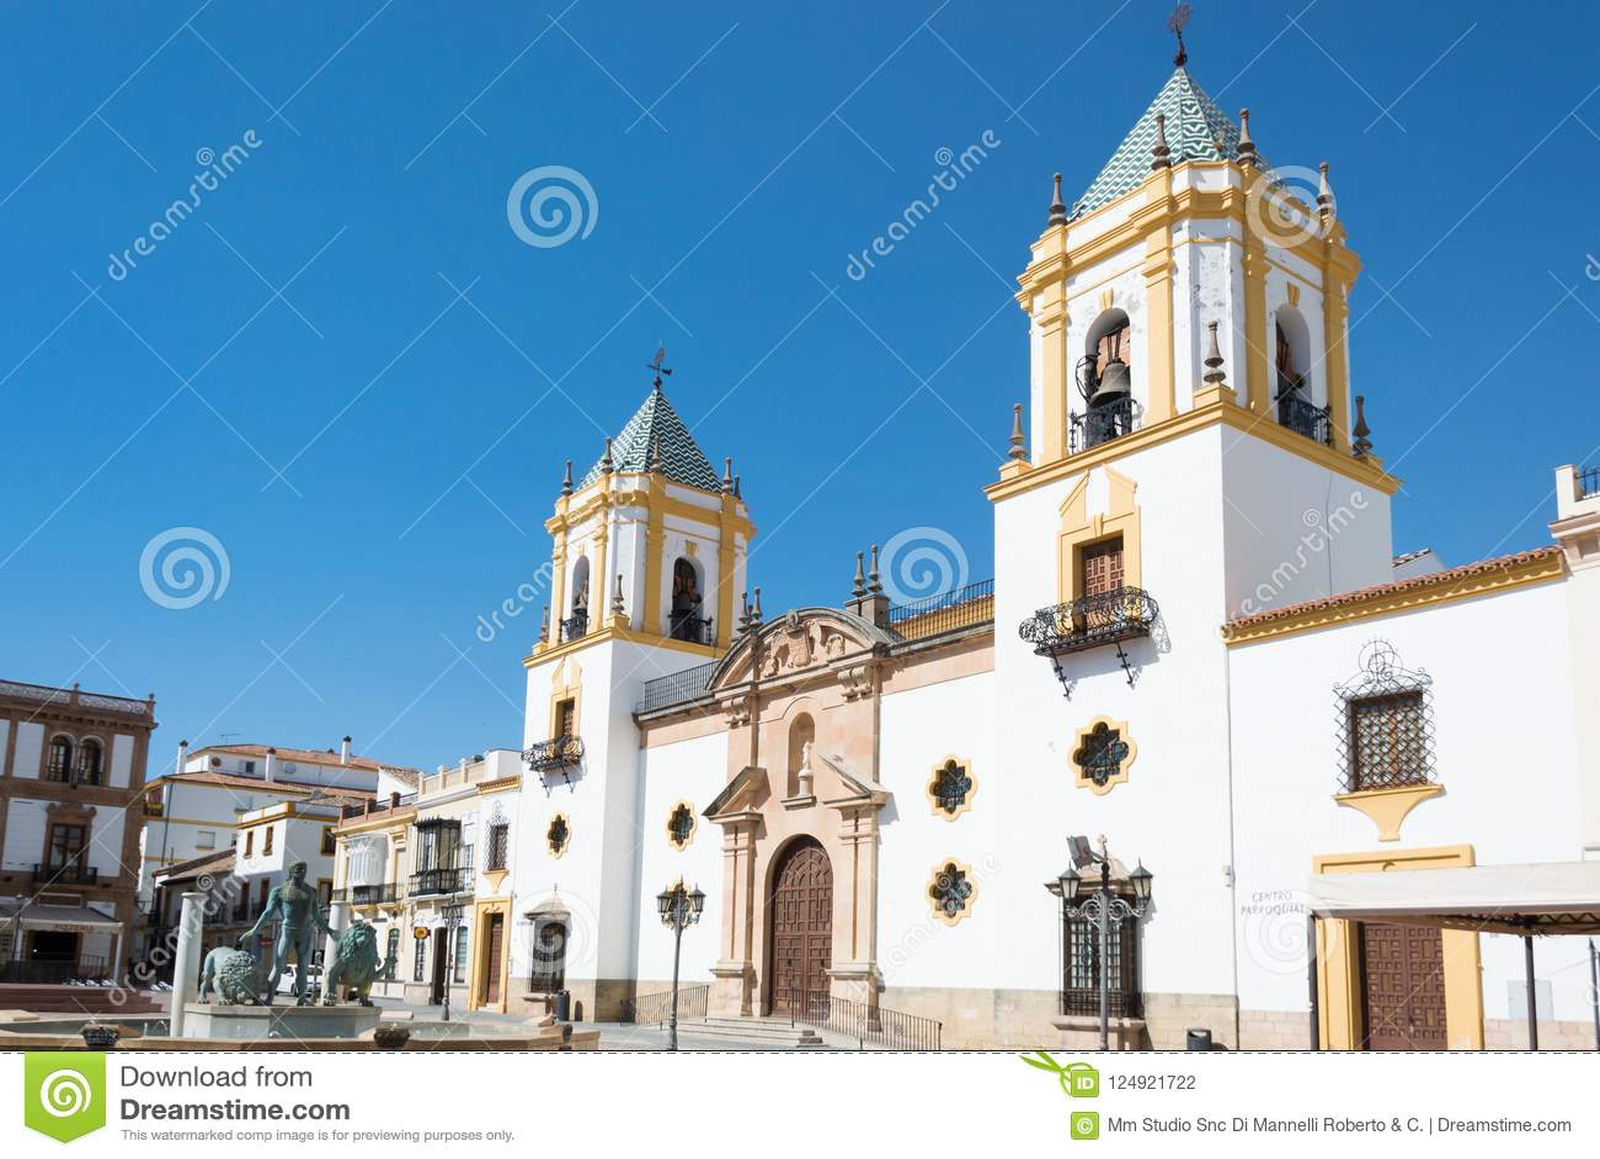 Ronda-Reise in Andalusien Spanien Europa